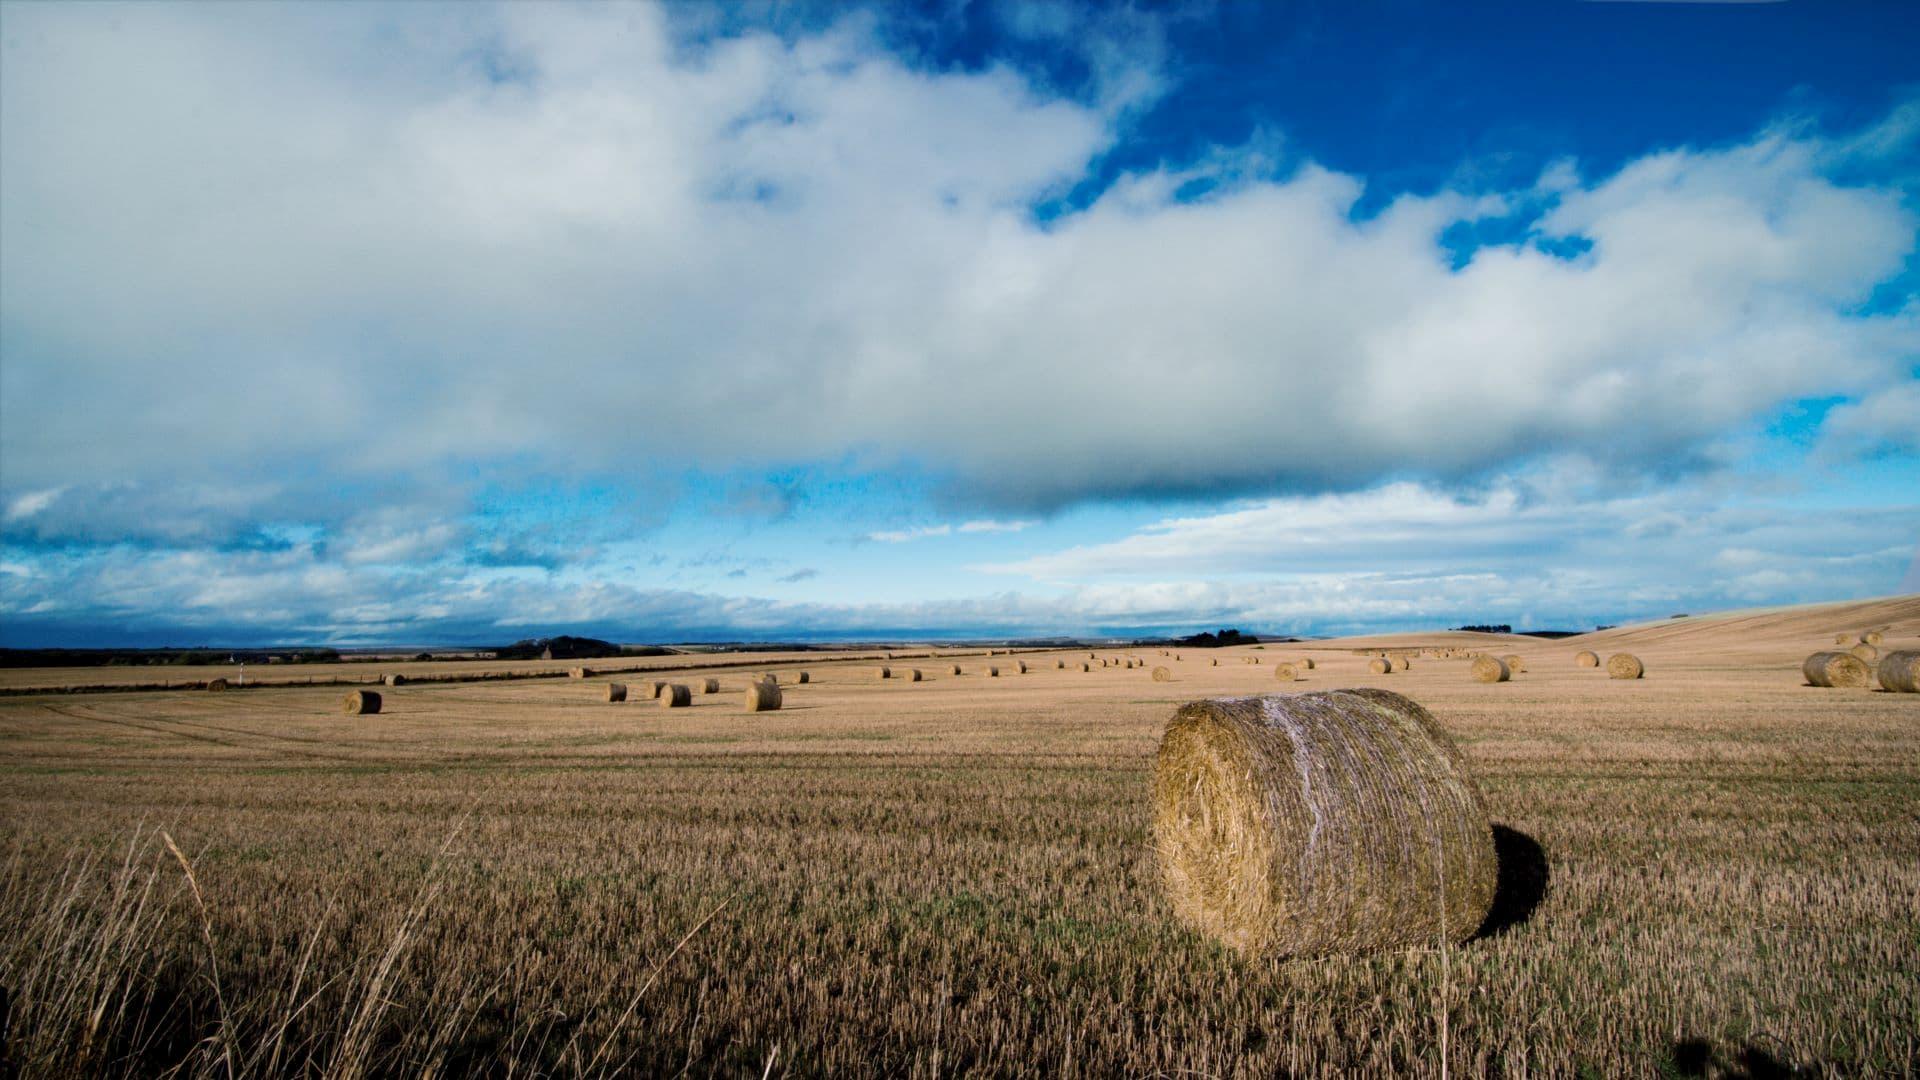 ballantines barley field